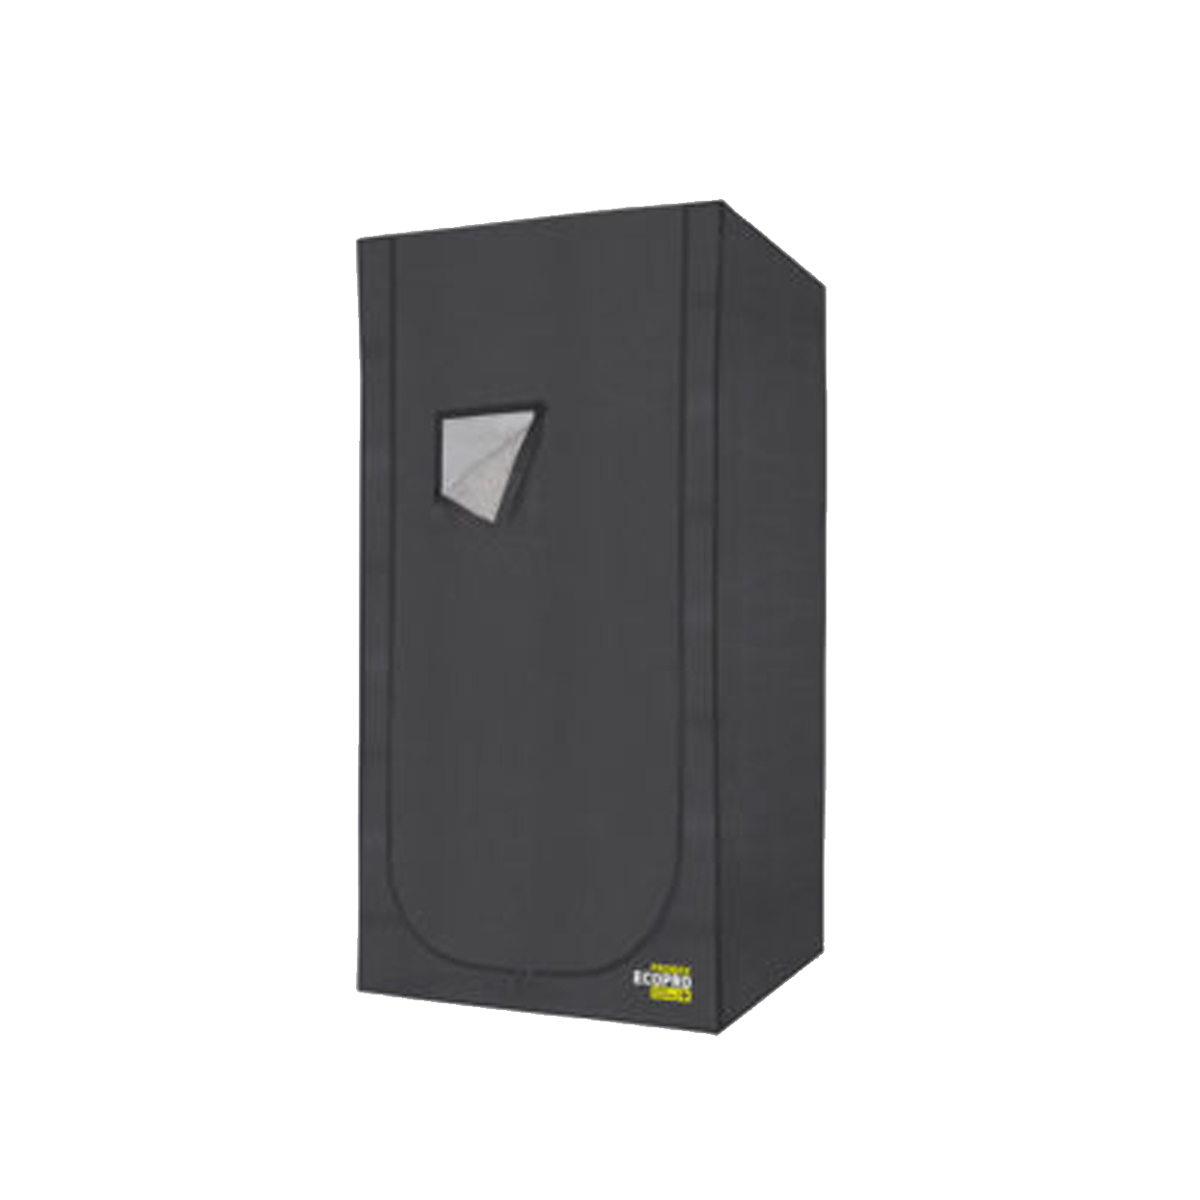 Estufa Pro Box Eco Pro 80 - 80x80x160 cm